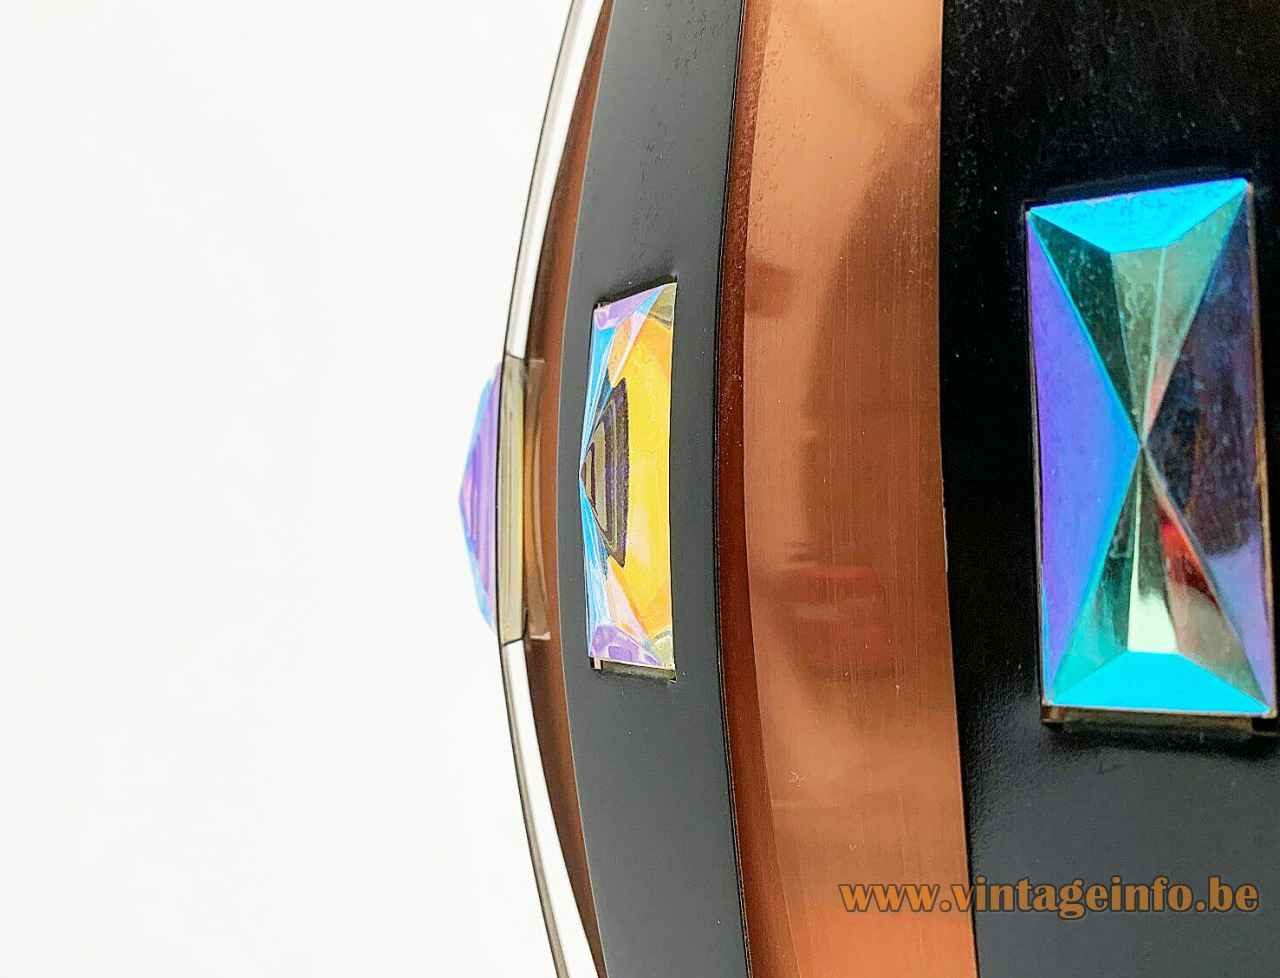 Coronell Elektro copper pendant lamp black convex folded slats lampshade 1960s design: Werner Schou close up